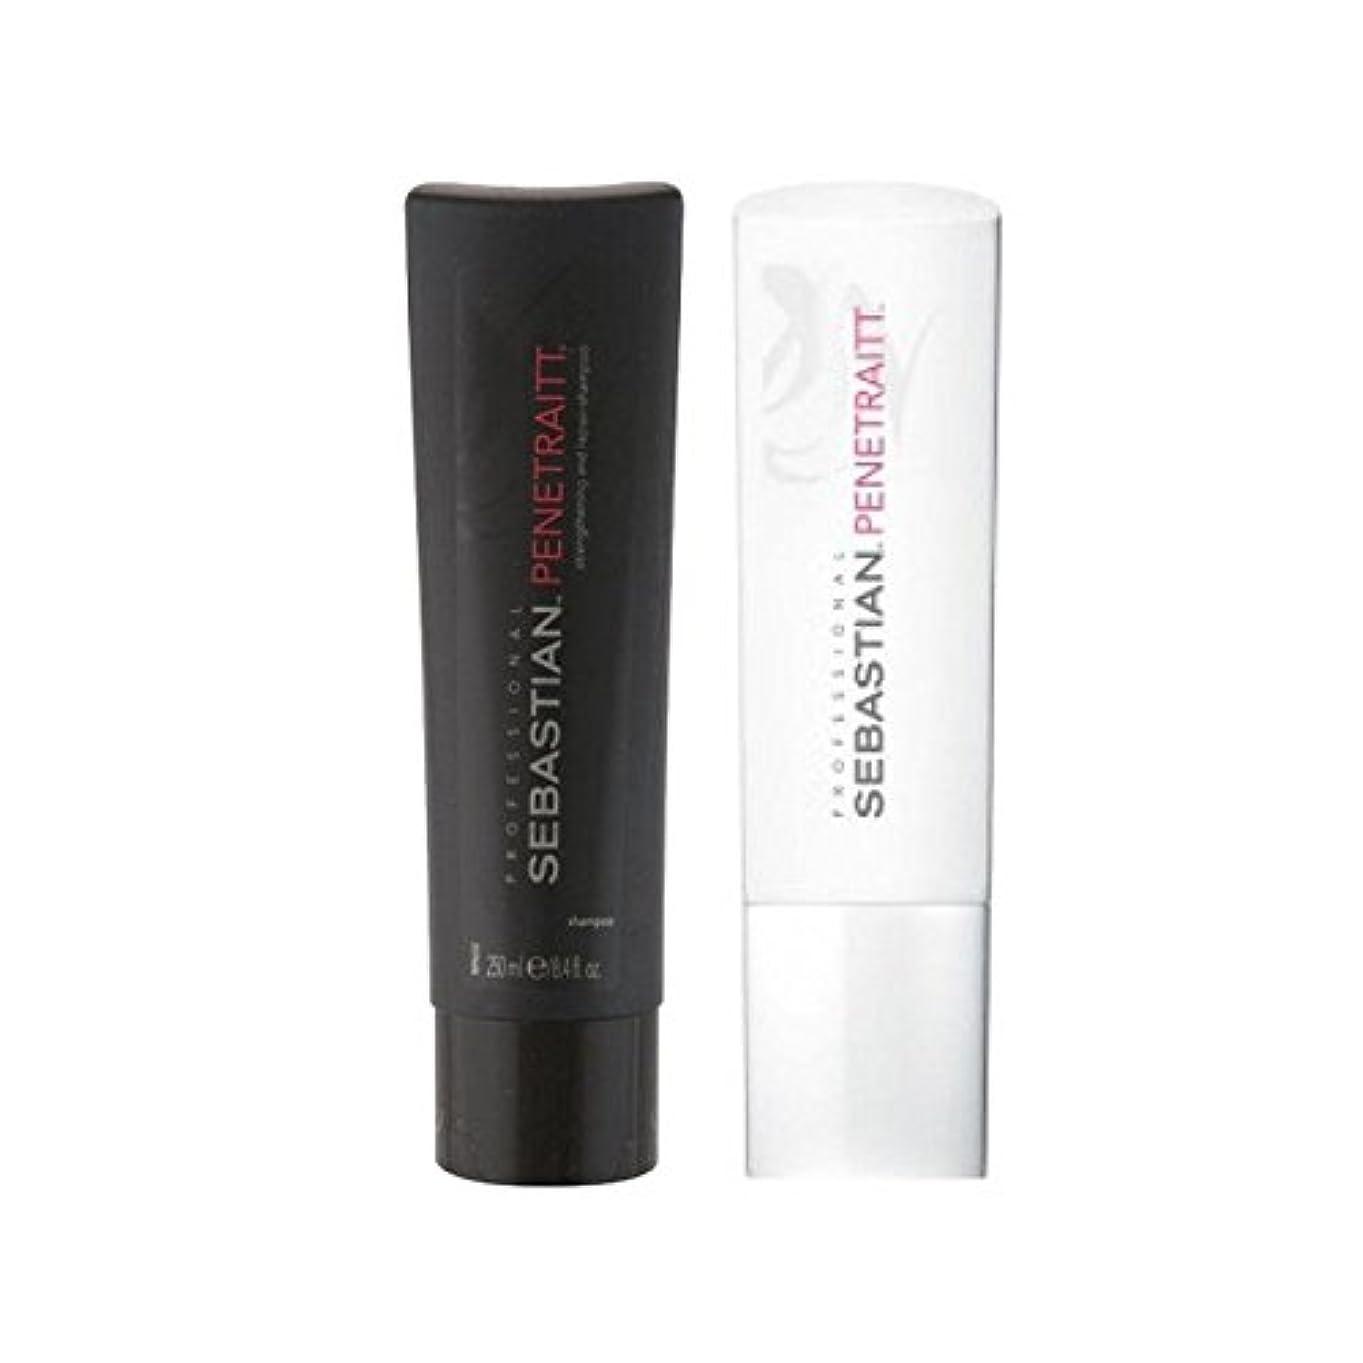 Sebastian Professional Penetraitt Duo - Shampoo & Conditioner - セバスチャンプロデュオ - シャンプー&コンディショナー [並行輸入品]